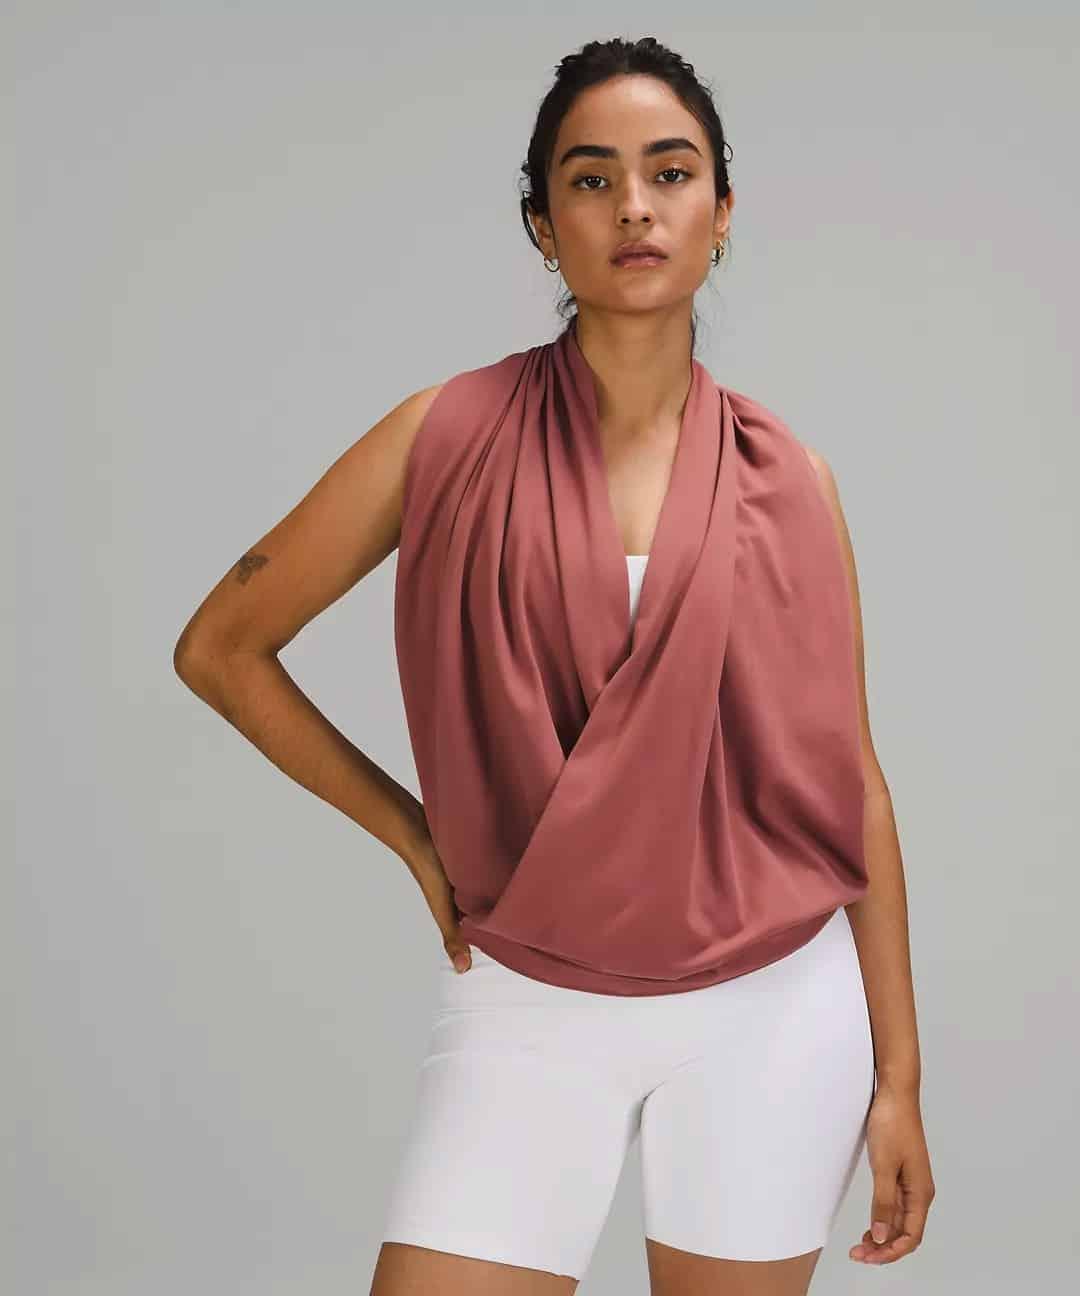 Customizable Snap Scarf | Women's Scarves & Wraps | lululemon